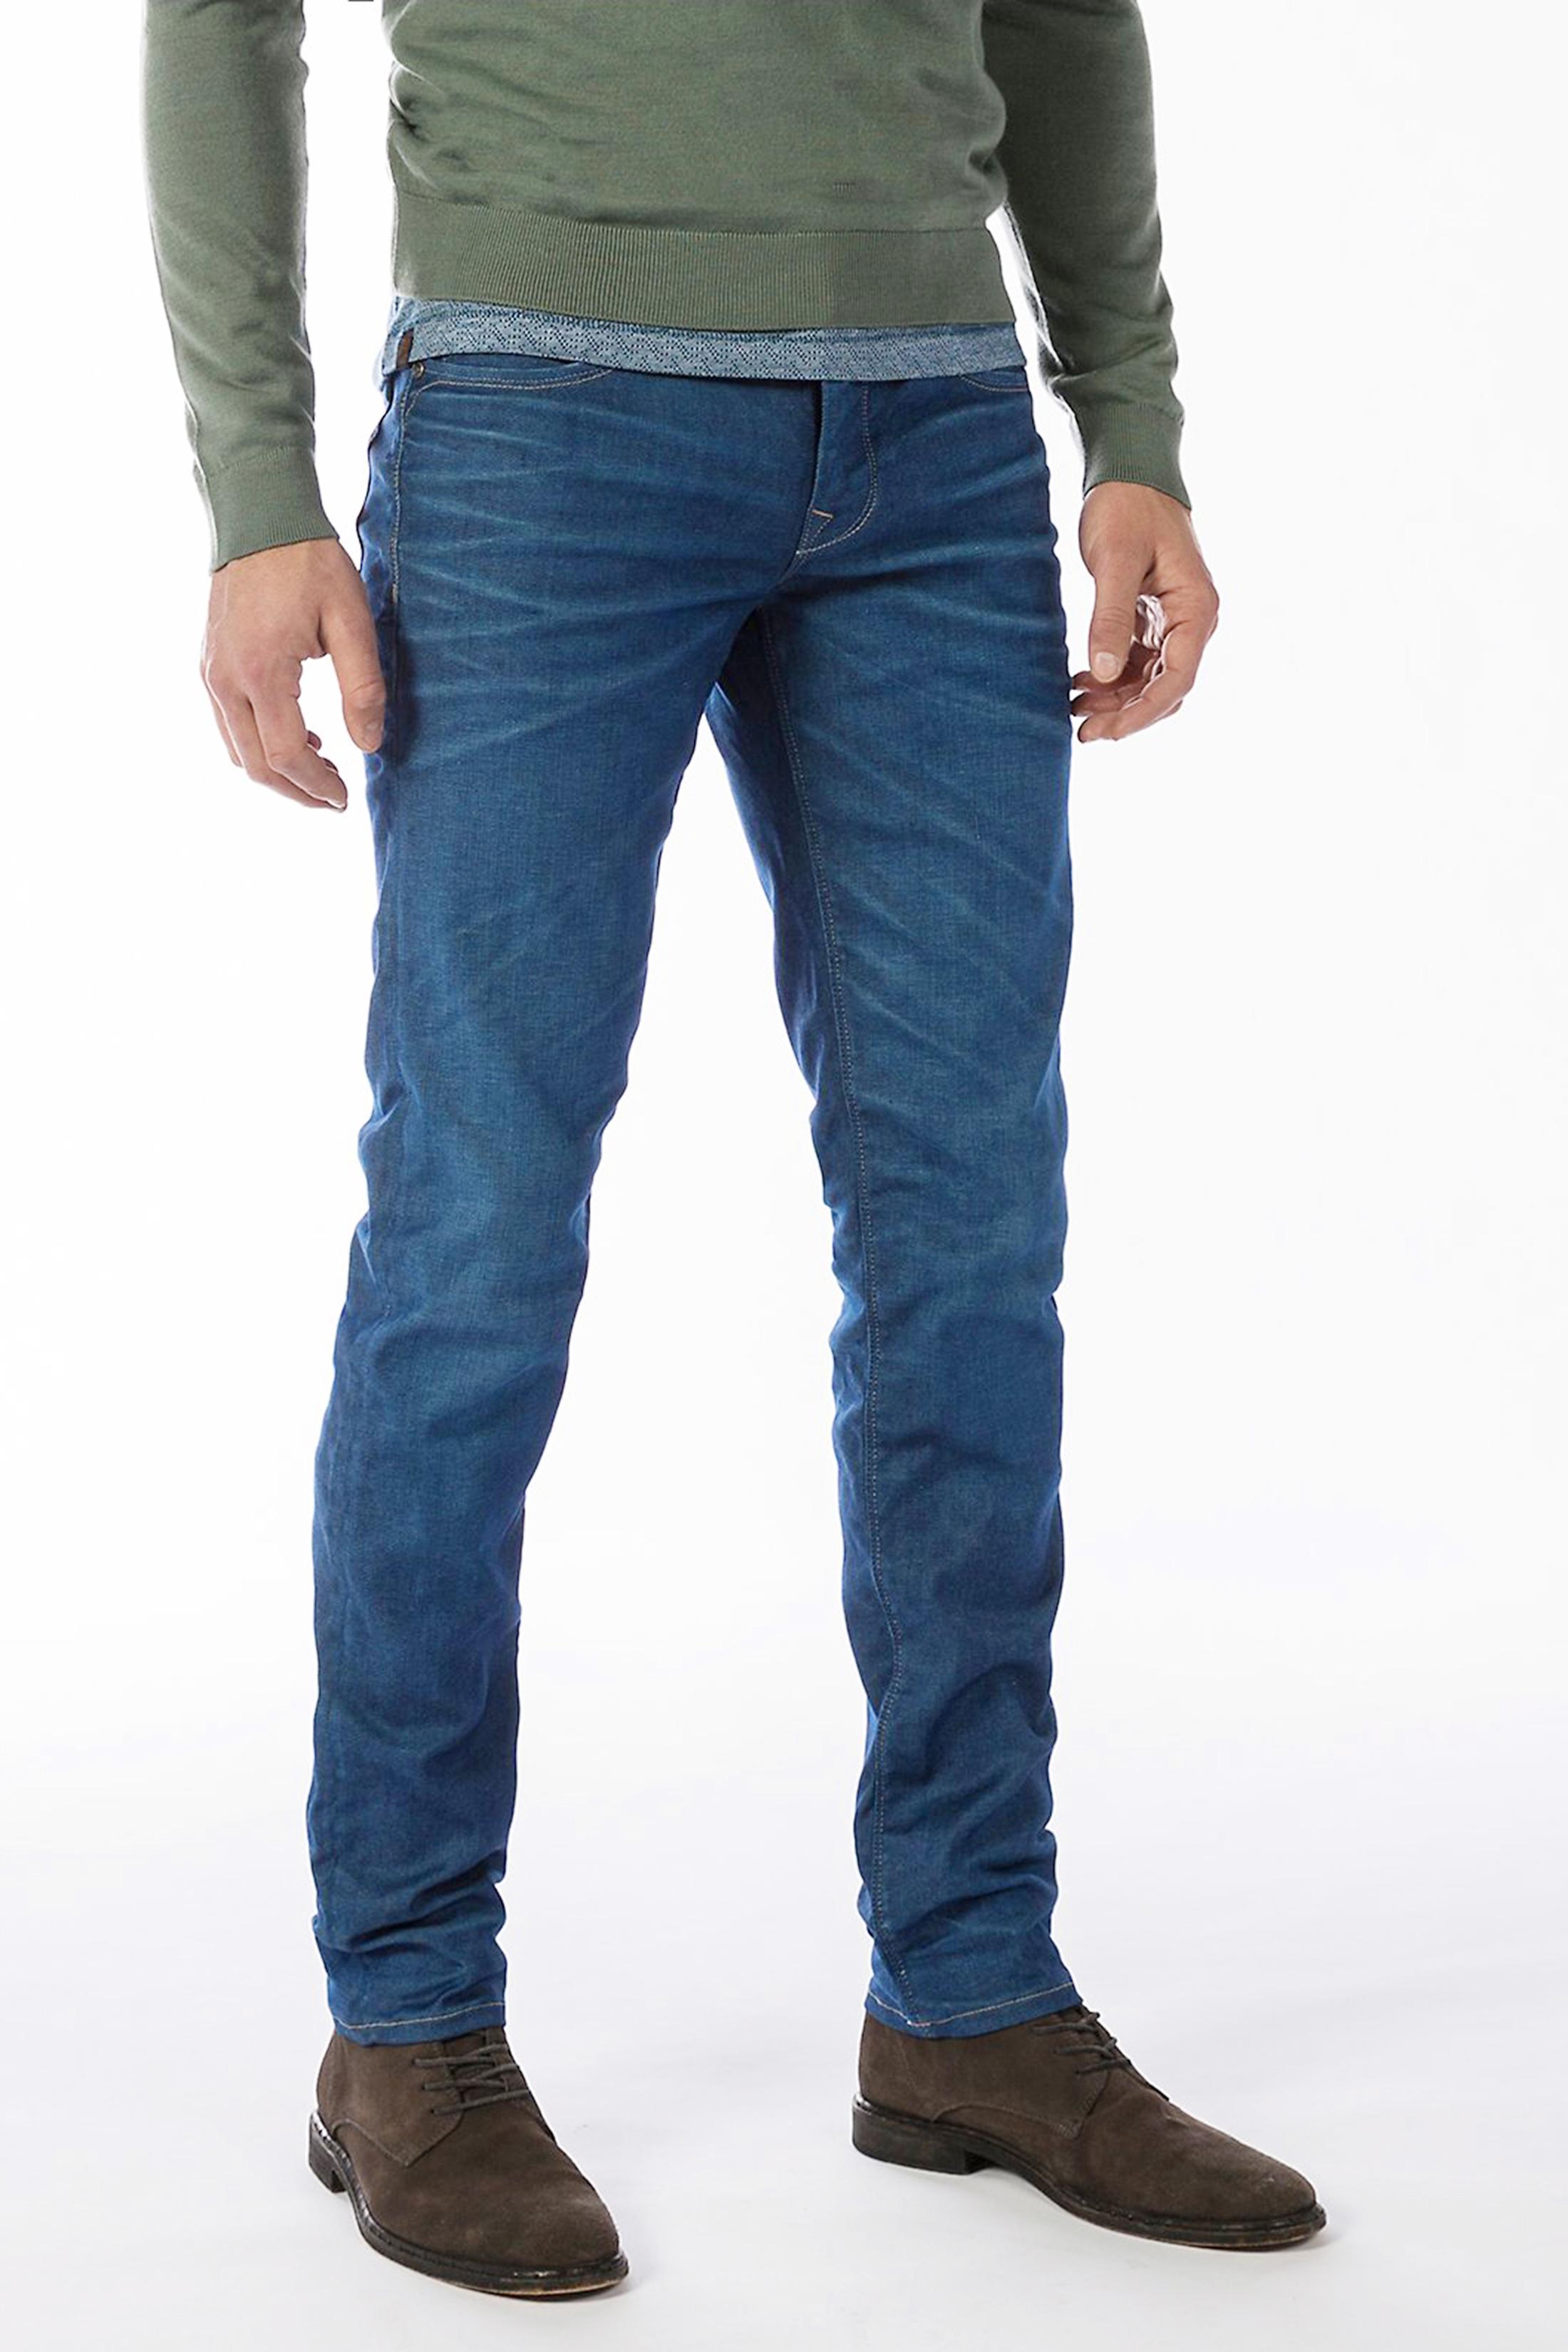 Vanguard V7 Rider Jeans foto 4